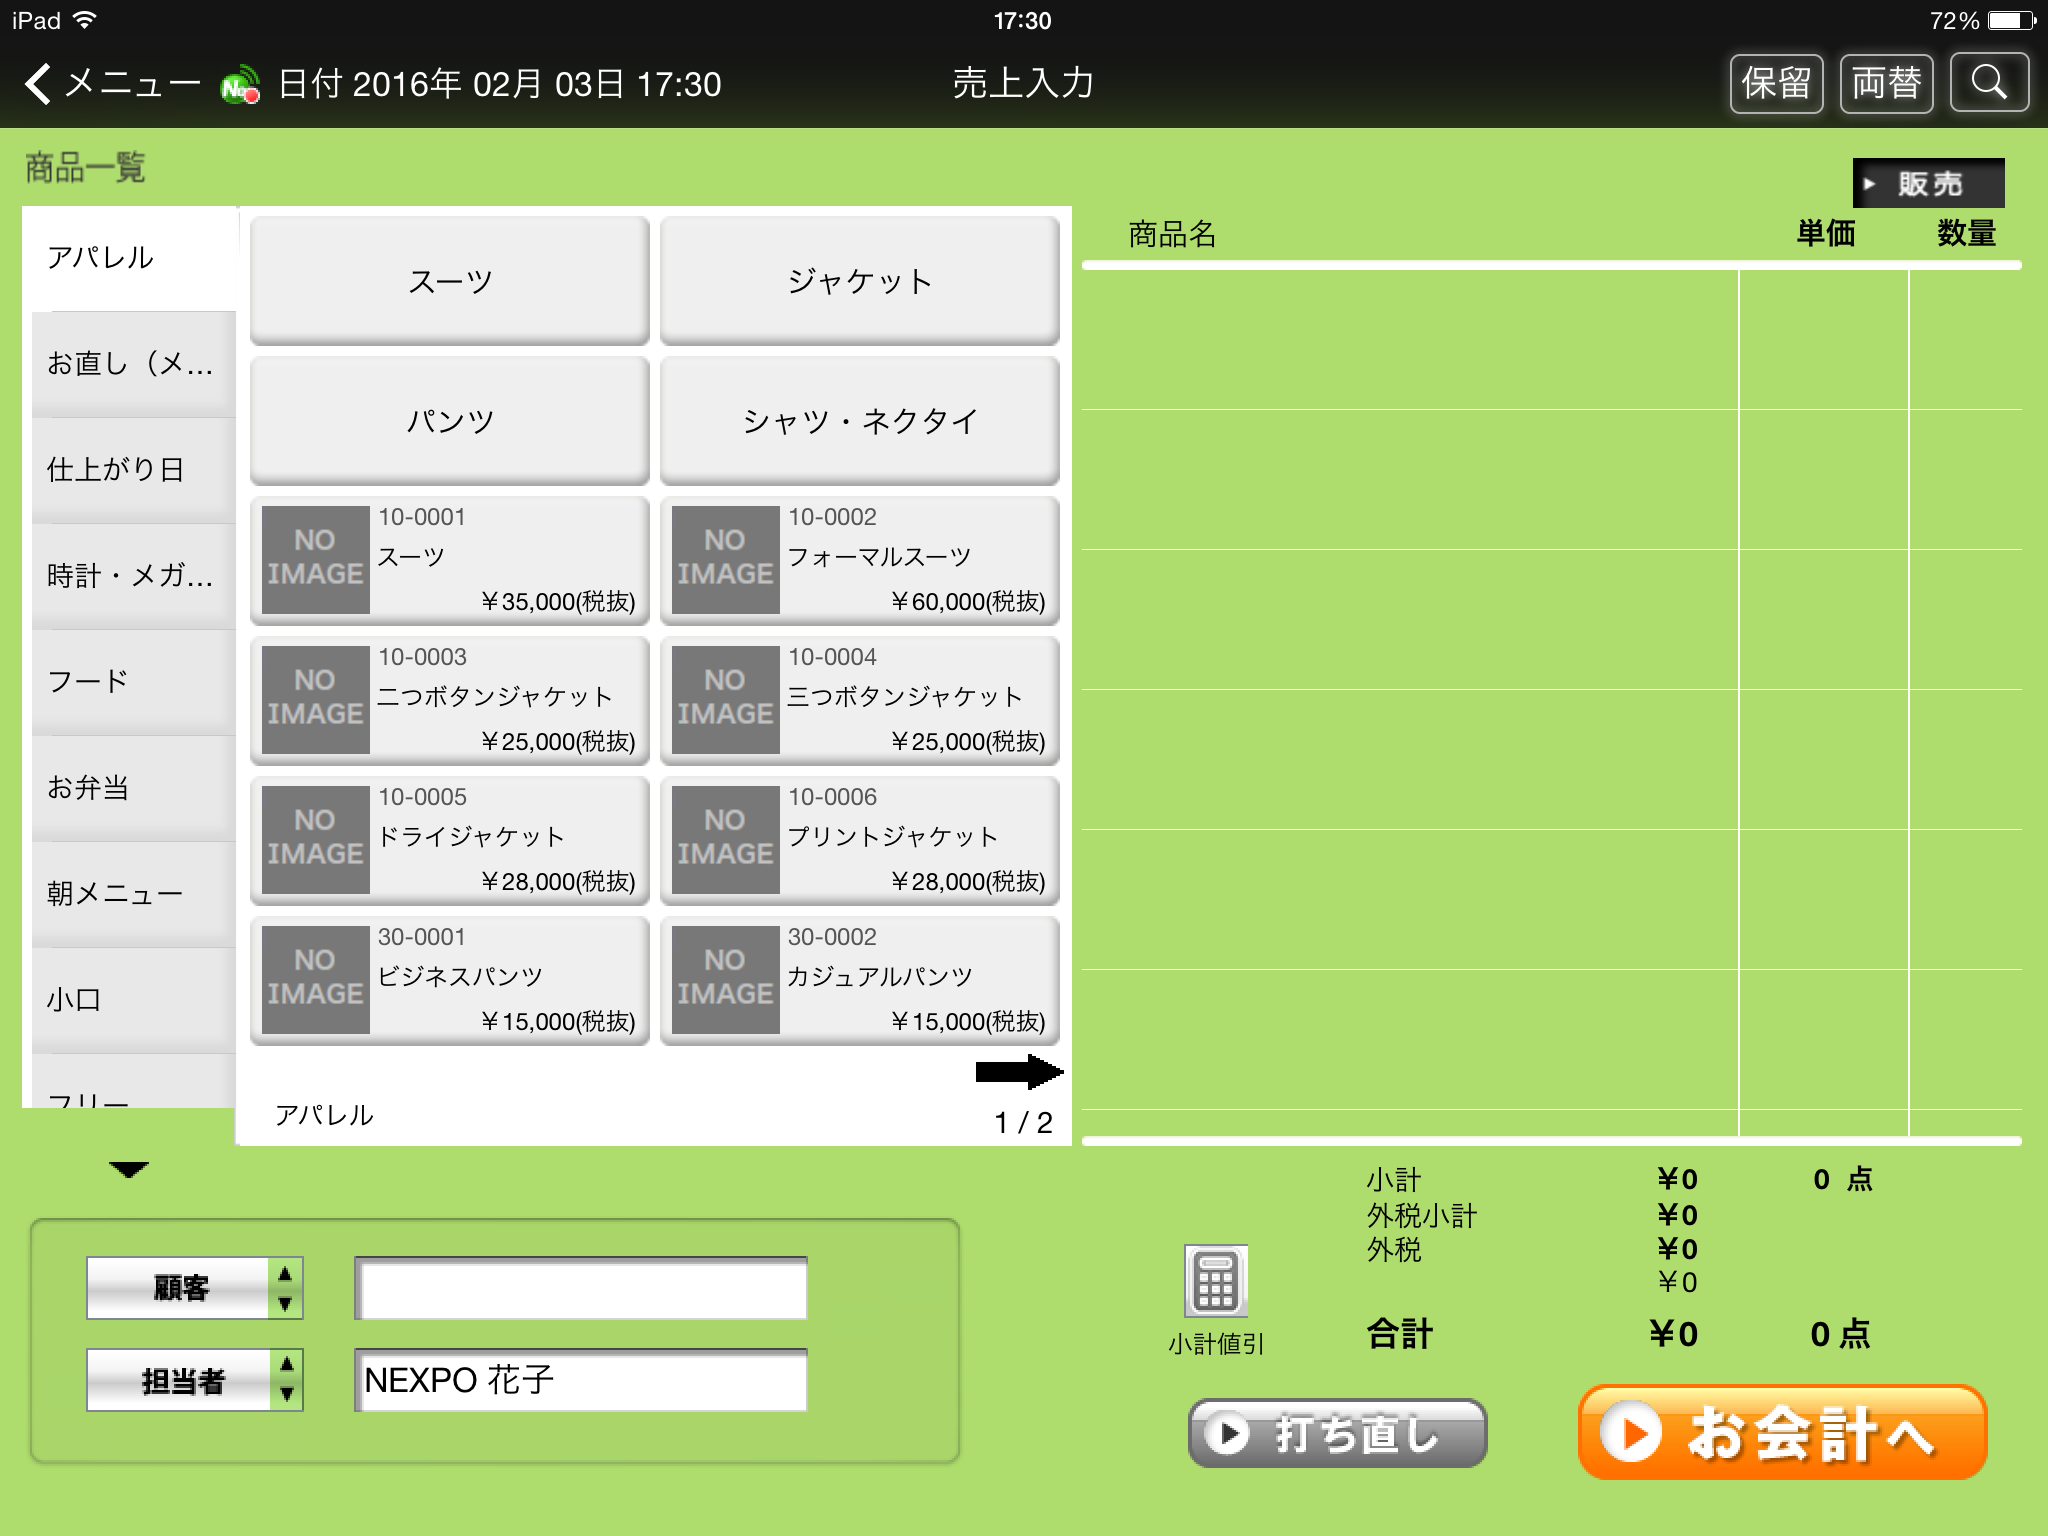 iPadレジでの両替イメージ